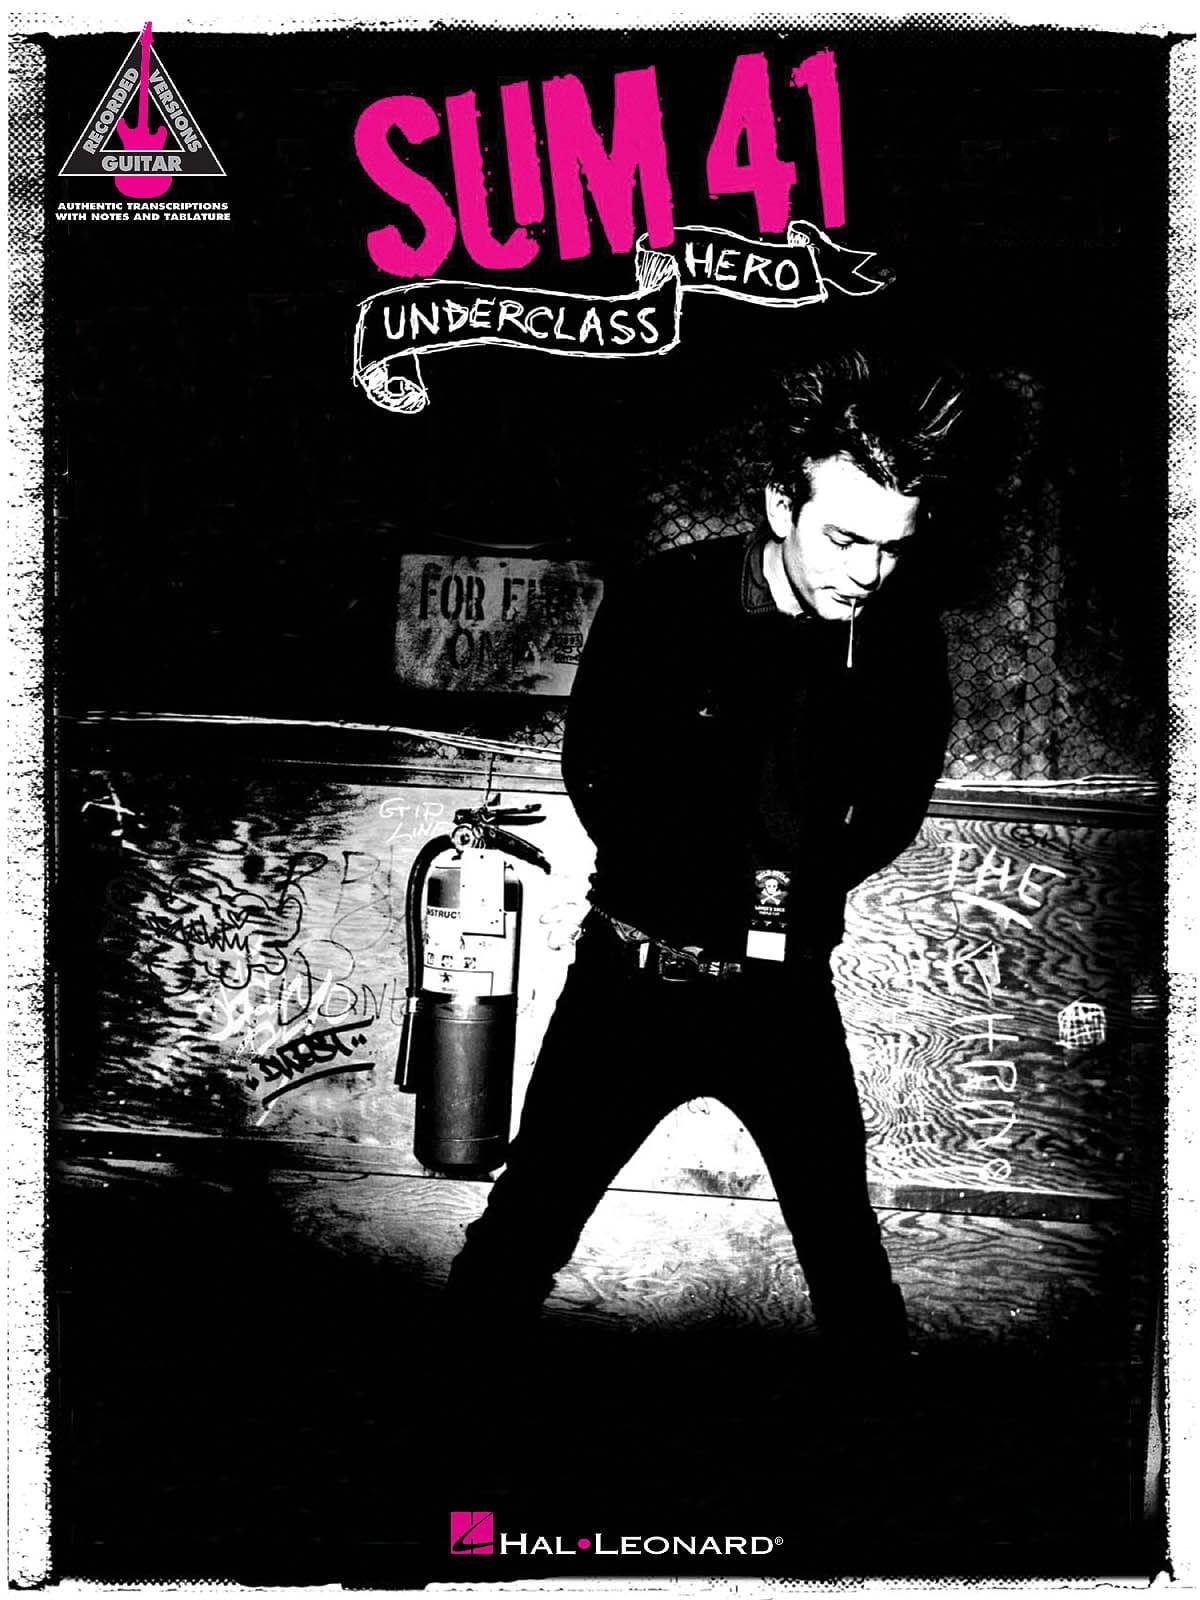 Underclass Hero - Sum 41 - Partition - Pop / Rock - laflutedepan.com